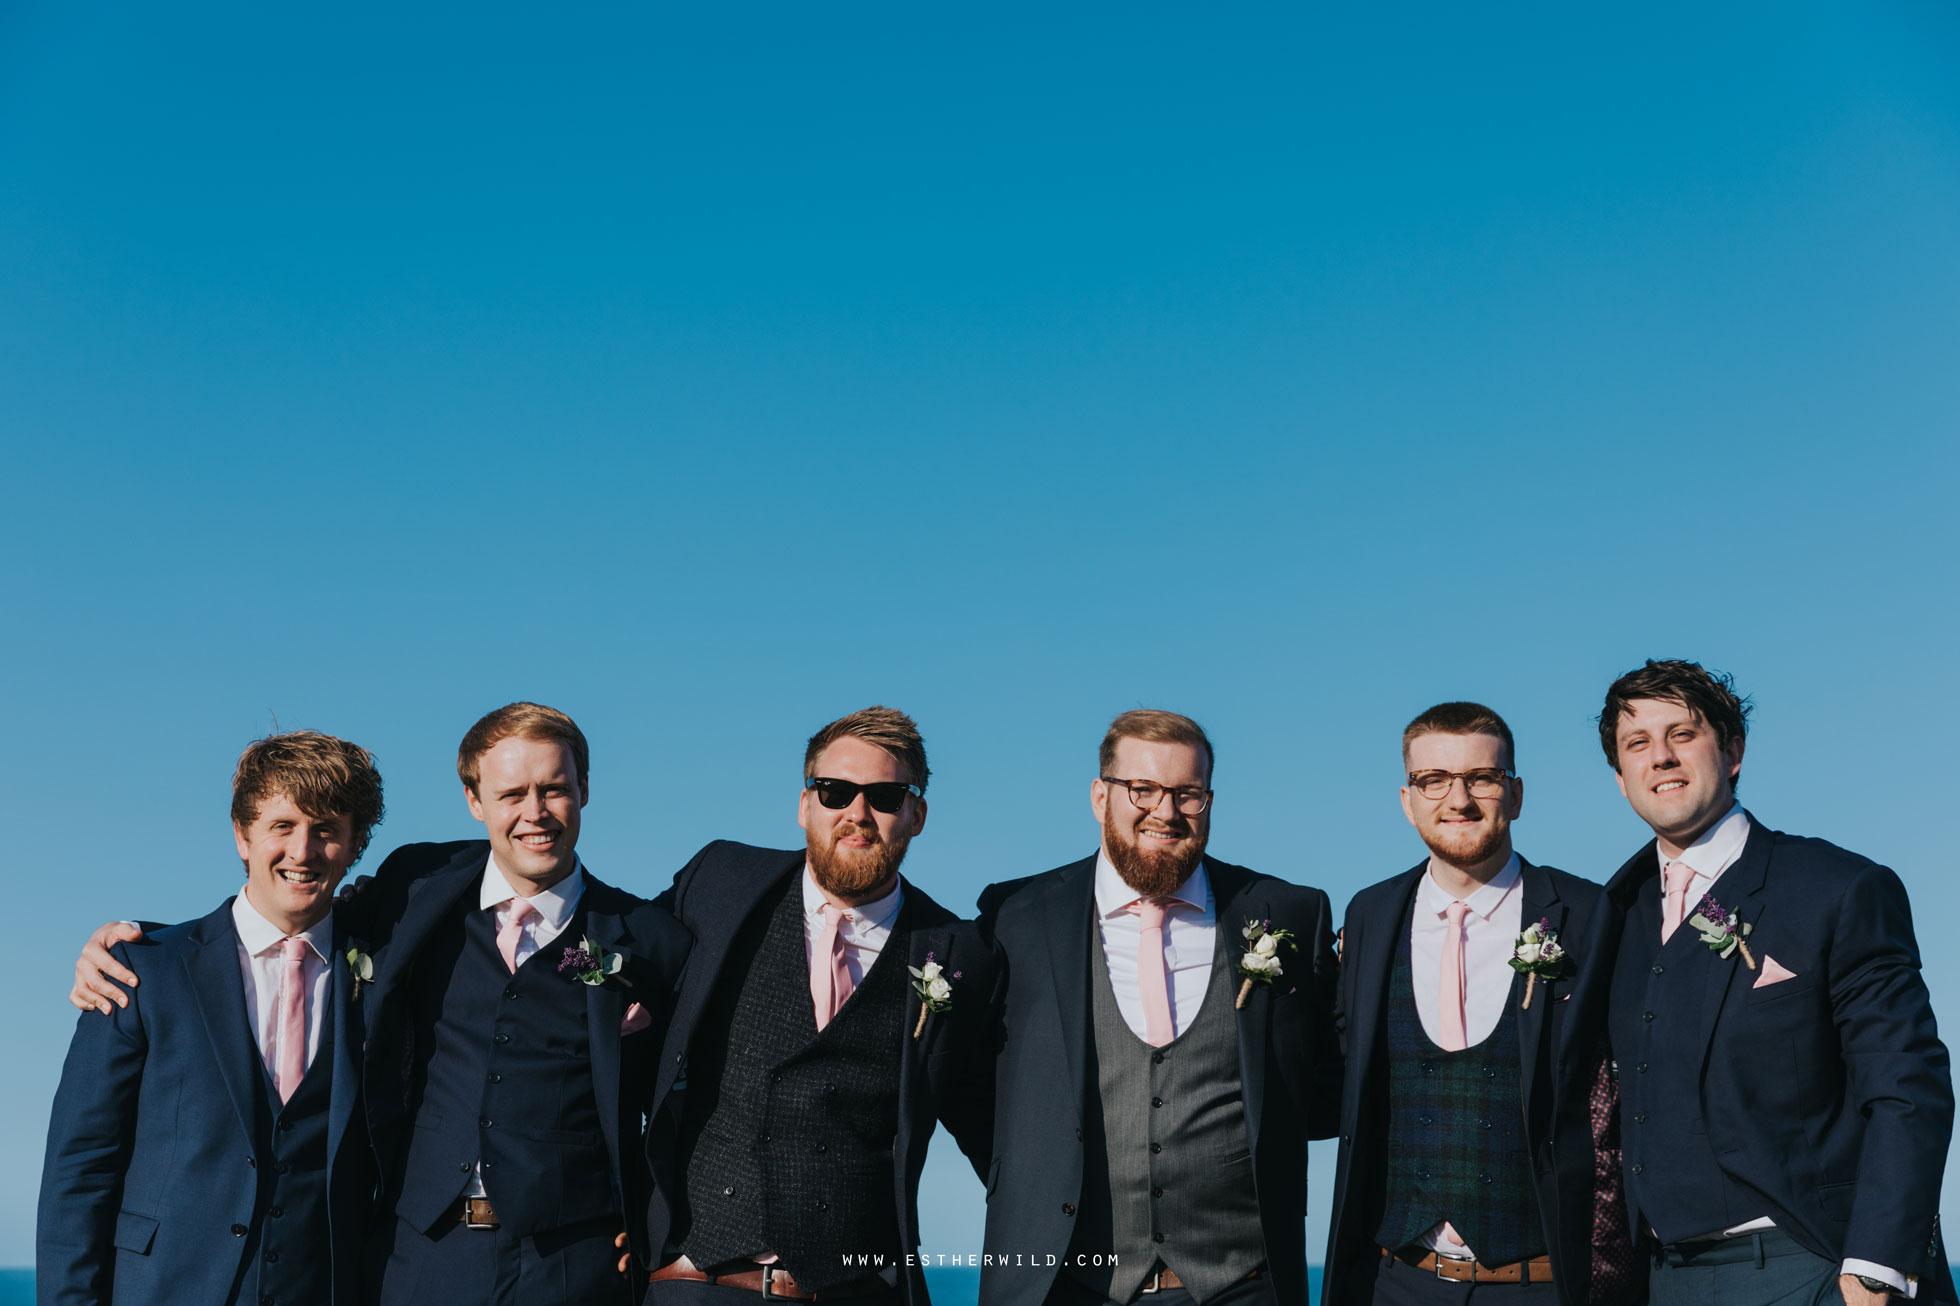 Cromer_Wedding_Beach_Outdoor_Ceremony_Norfolk_North_Lodge_Registry_Office_Rocket_House_Cafe_Cromer_Pier_IMG_4415.jpg